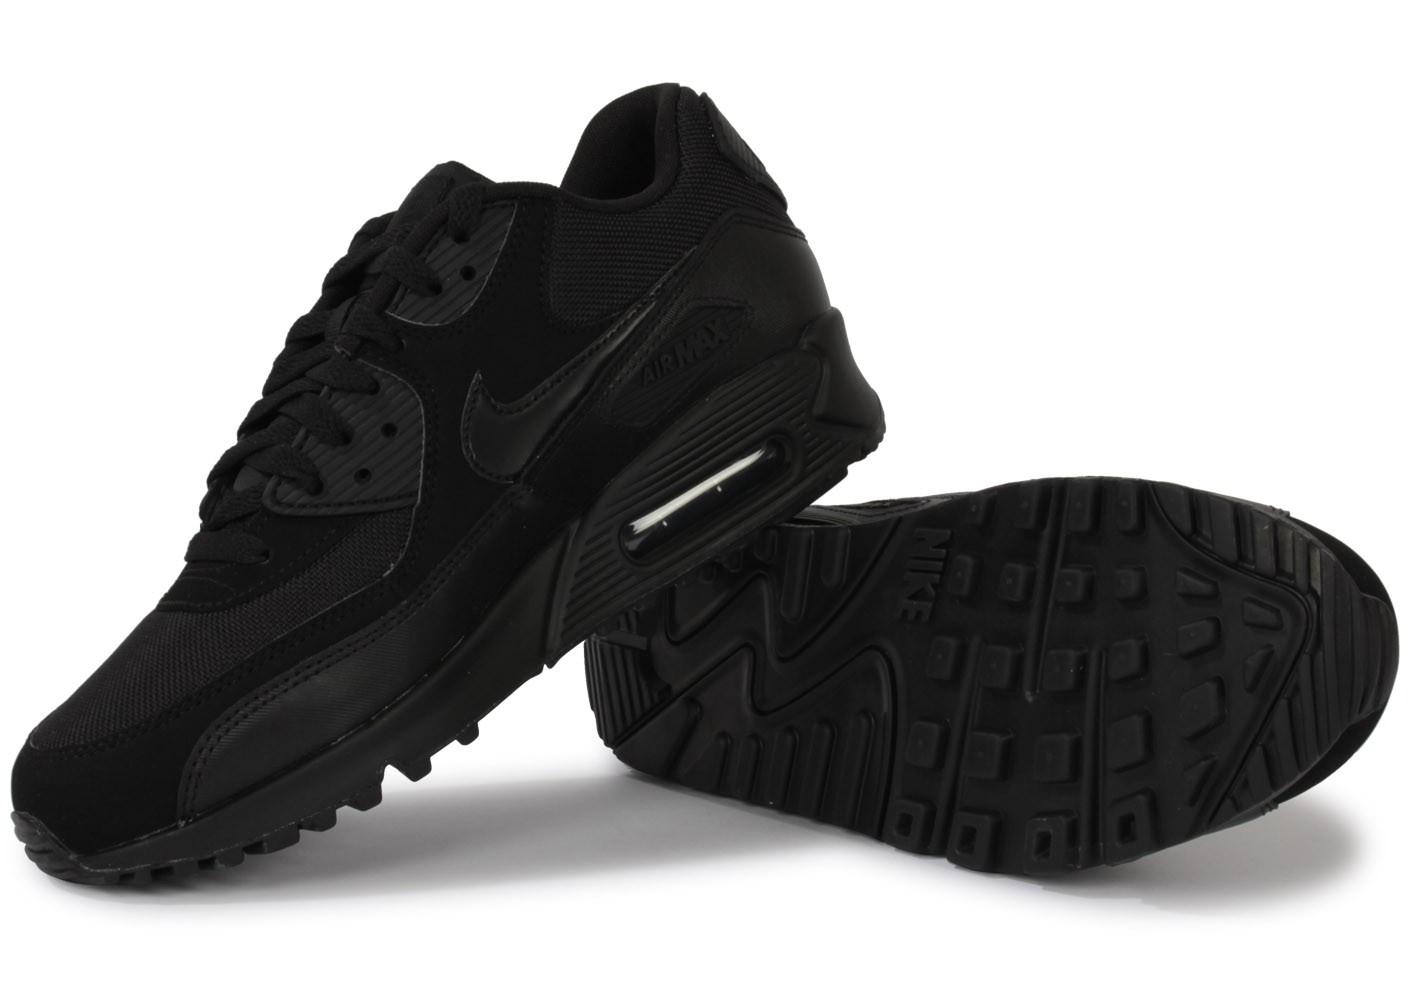 chaussure nike noire femme